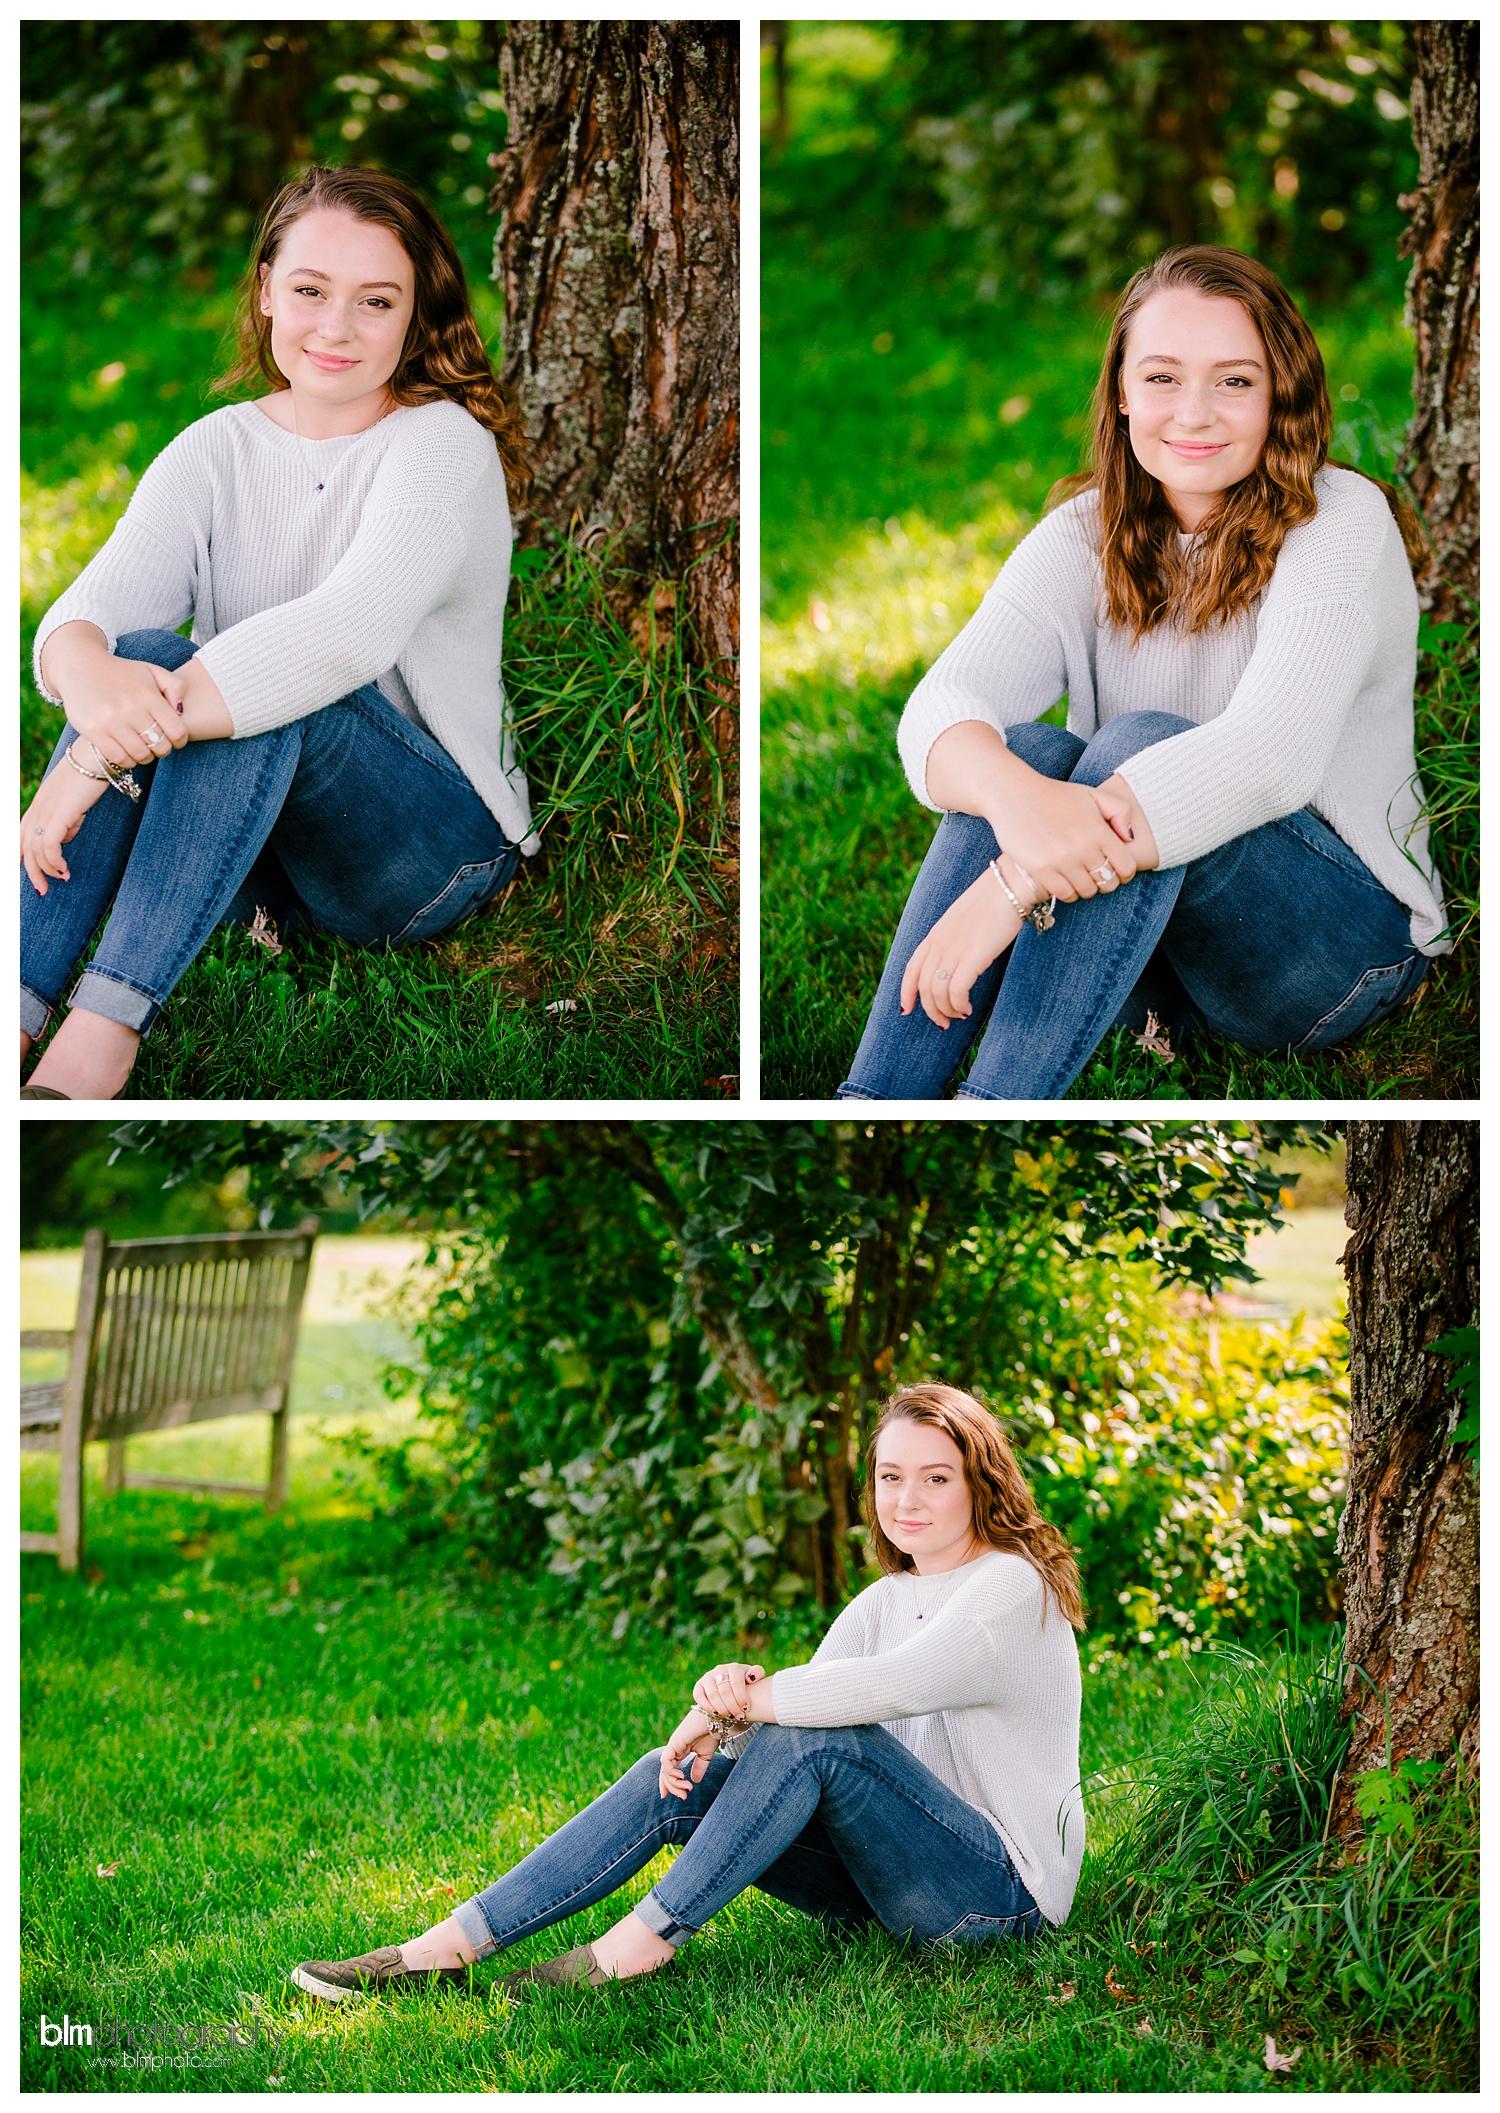 BLM,Brianna Morrissey,Brie Morrissey,Caragh Torphy,Caragh-Torphy_Senior-Portraits,High School Senior,On Location Portrait,Outdoor Portrait,Photo,Photographer,Photography,Senior Photos,Senior Portraits,Sep,September,www.blmphoto.com/contact,©BLM Photography 2017,